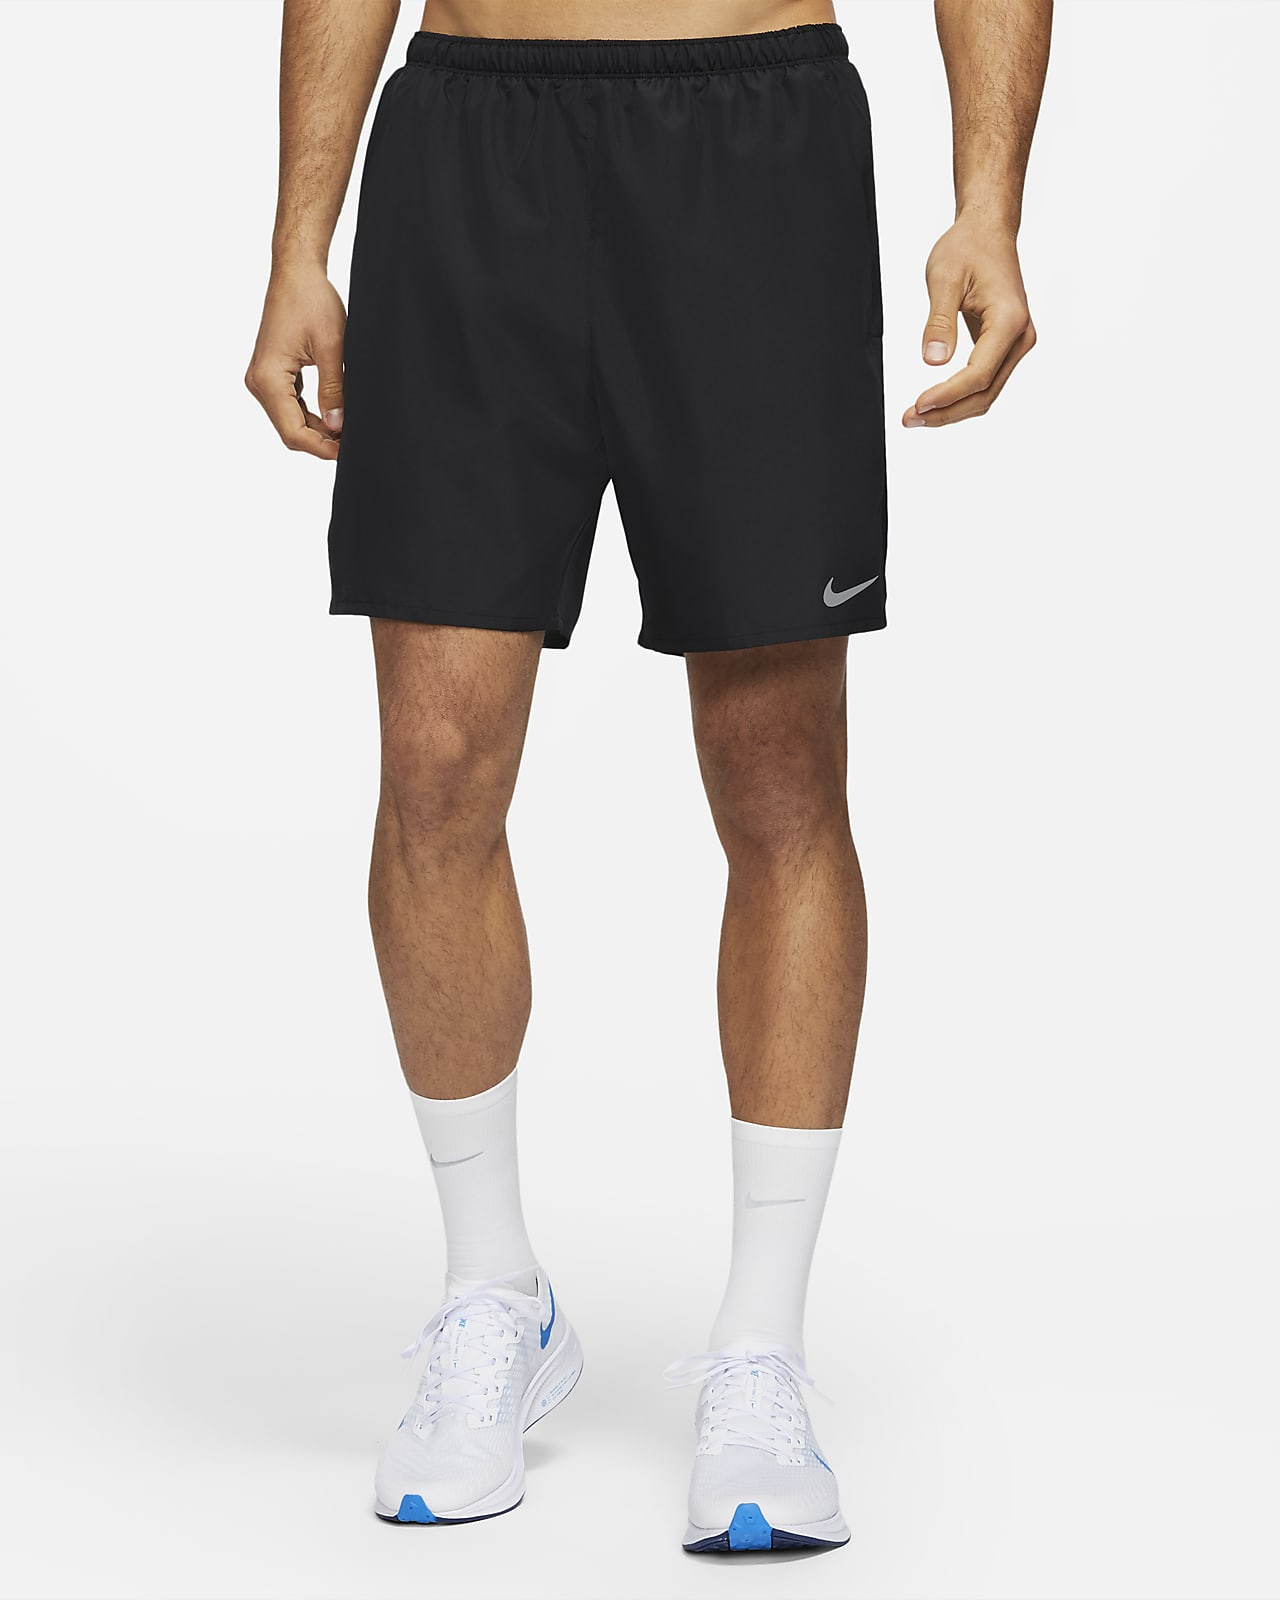 Short de running 2-en-1 Nike Challenger pour Homme